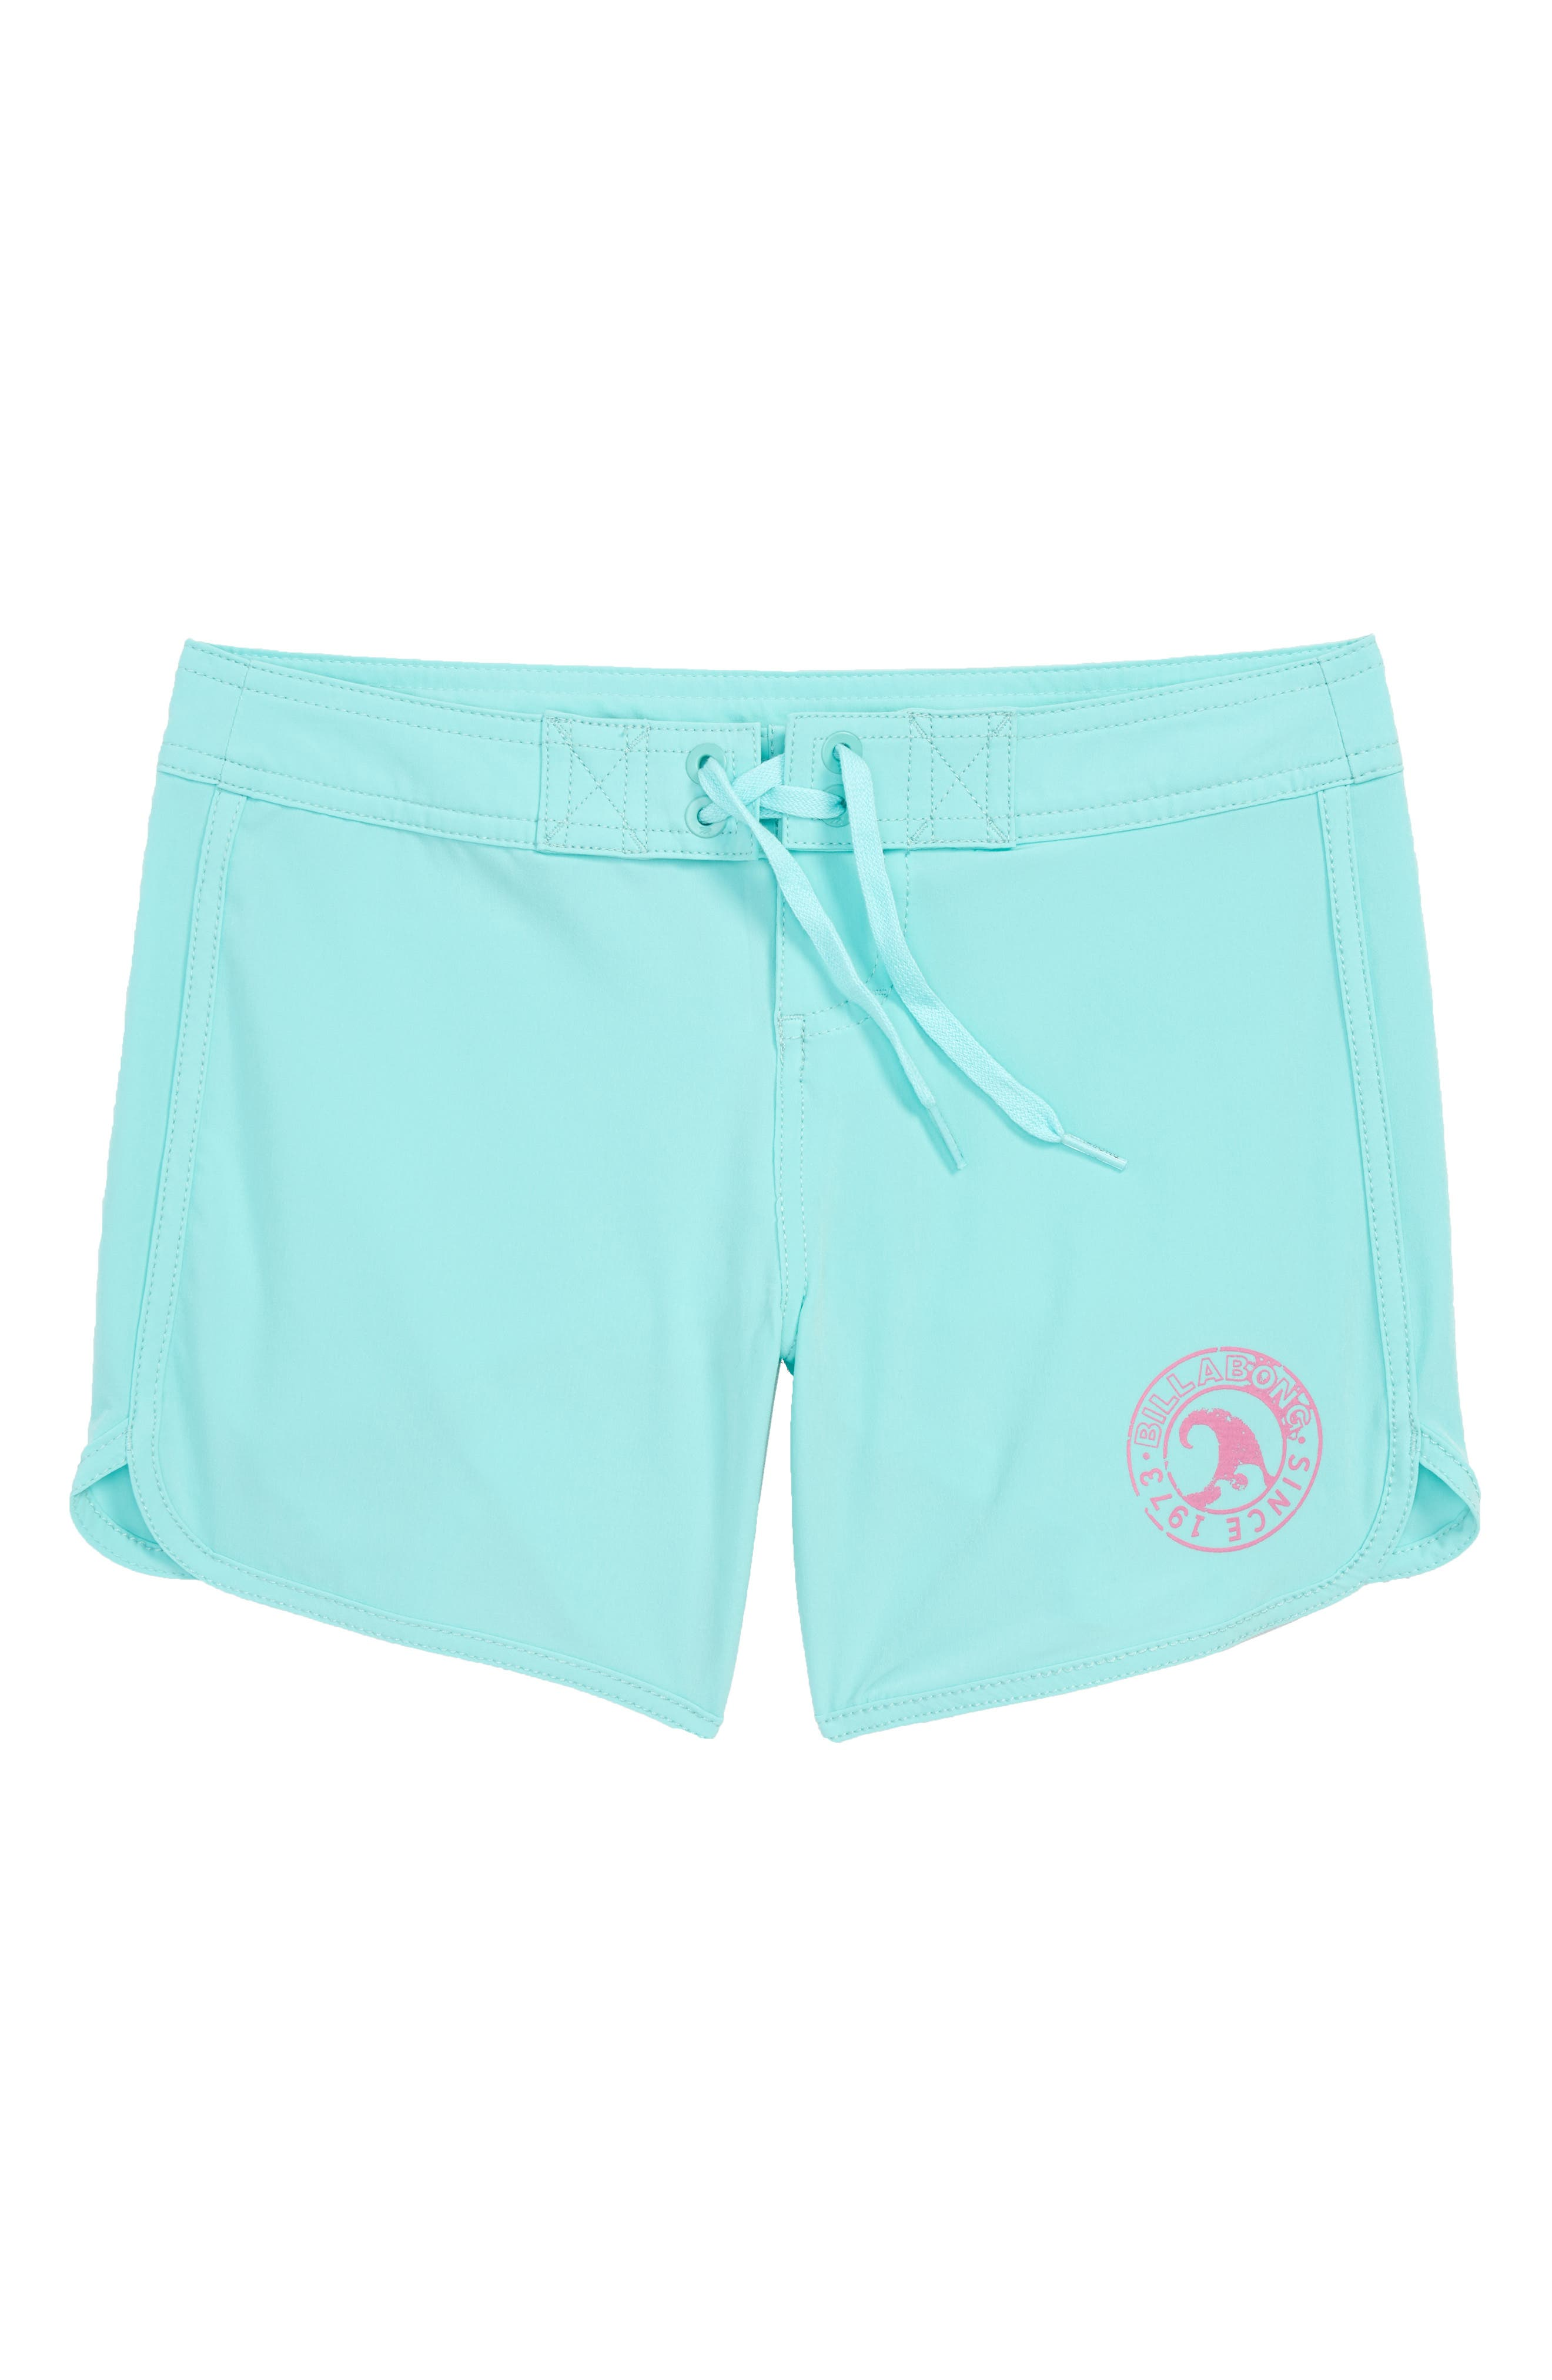 Sol Searcher Board Shorts,                             Main thumbnail 1, color,                             Beach Glass